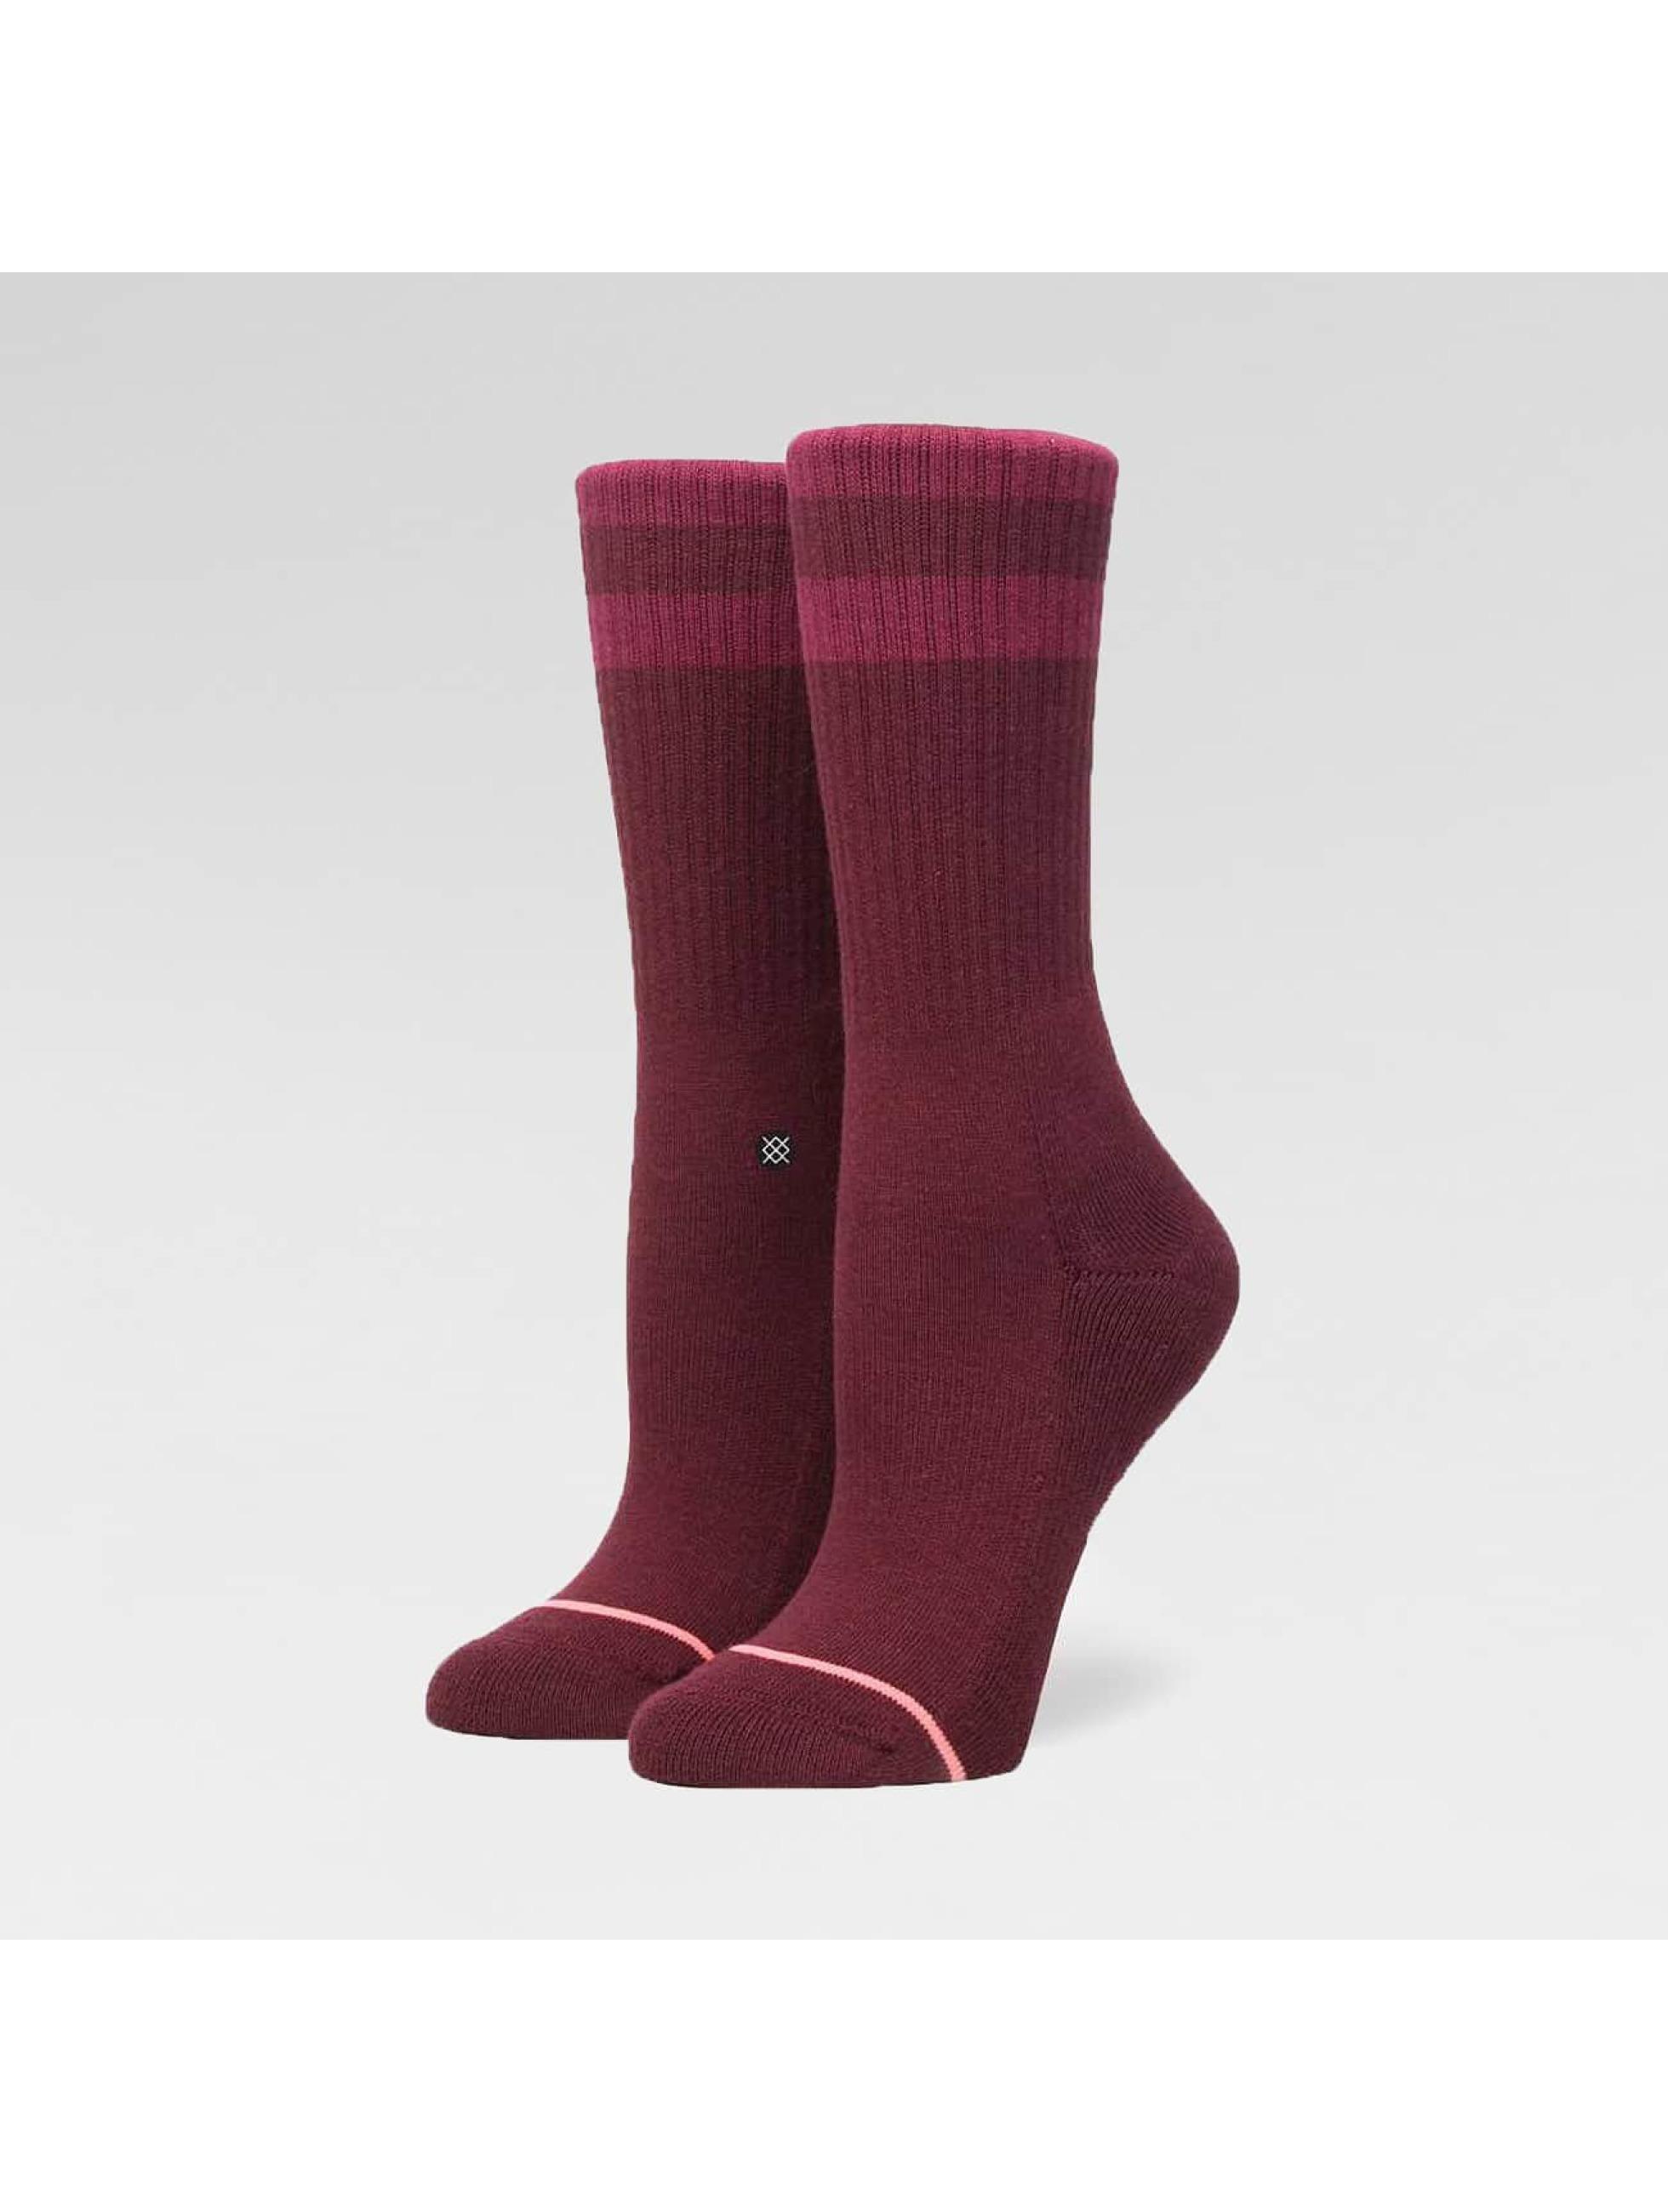 Stance Frauen Socken Uncommon Classic Crew in rot